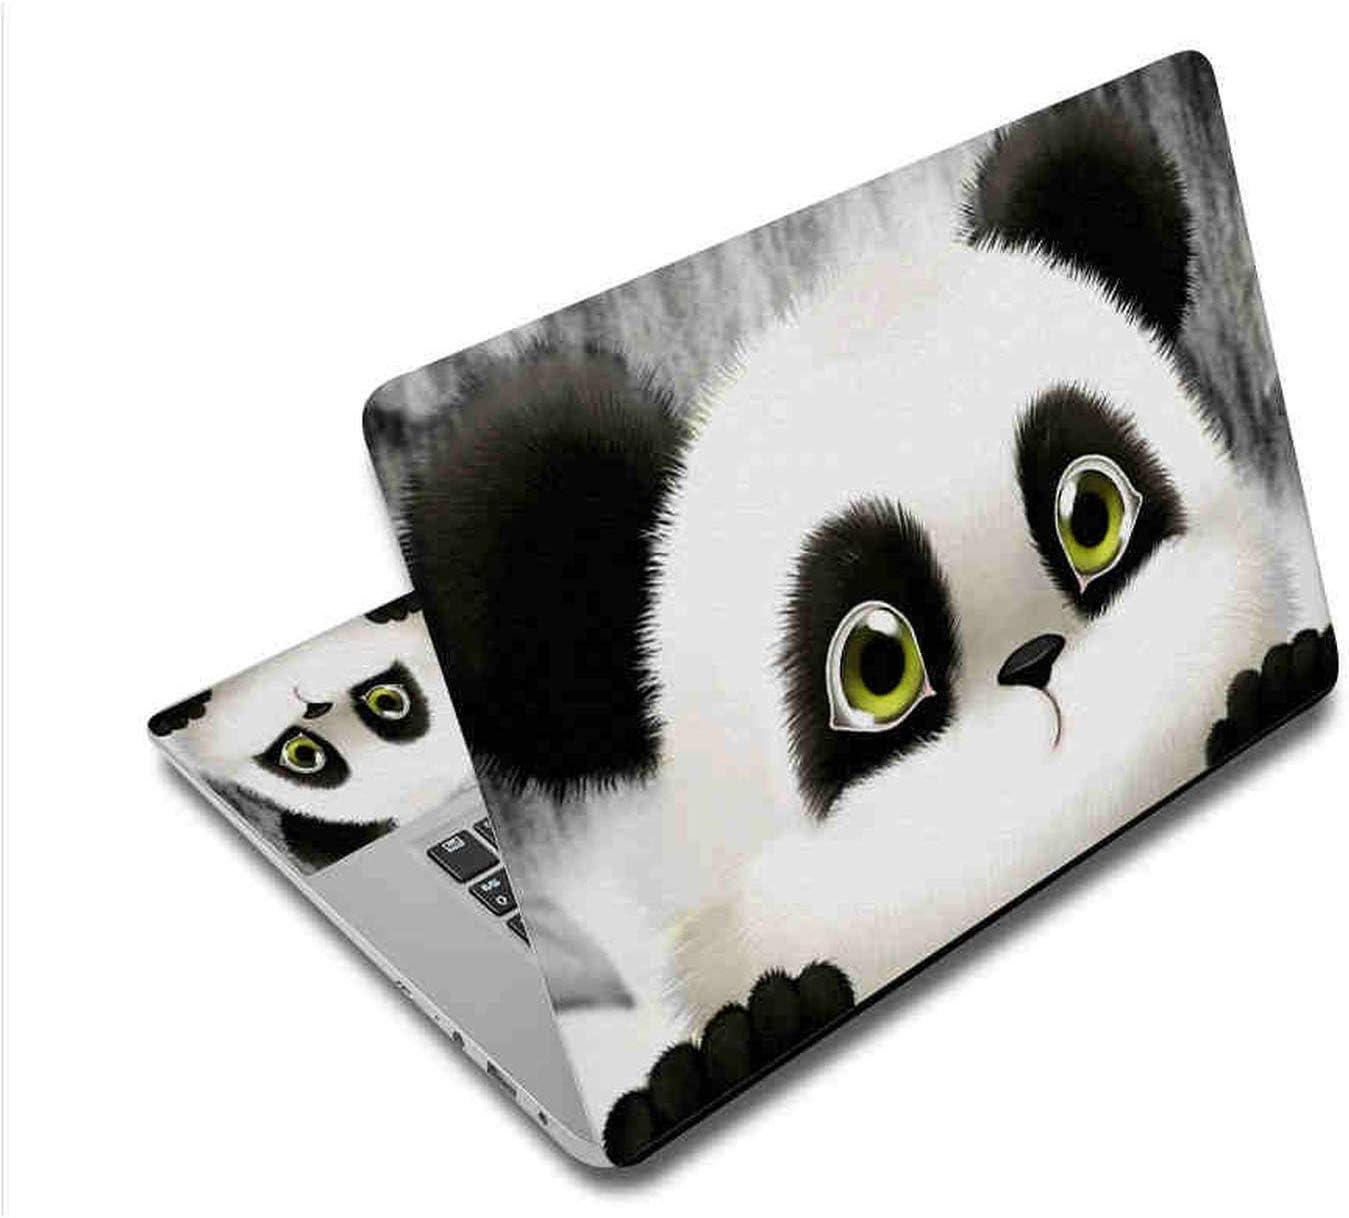 Who-Care Skin Universelle pour Ordinateur Portable 14 13,3 15,6 17,3 11,6 pour Macbook//Lenovo//Acer//Xiaomi pour Air//HP